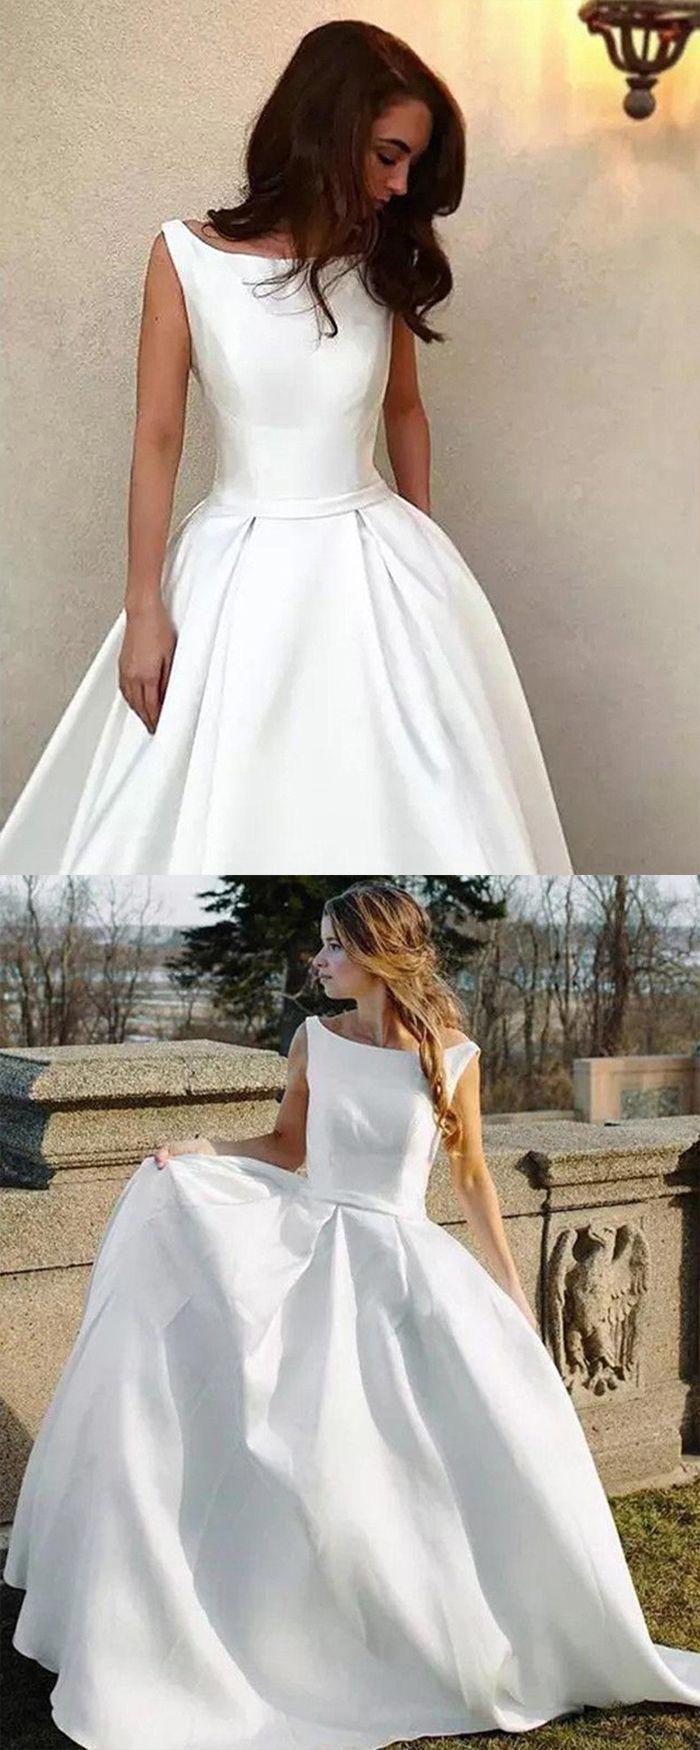 Simple Satin Wedding Dress A Line Bridal Dress For Fall Weddingdressescollection Wedding Dresses Lace A Line Bridal Gowns Wedding Dresses [ 1750 x 700 Pixel ]